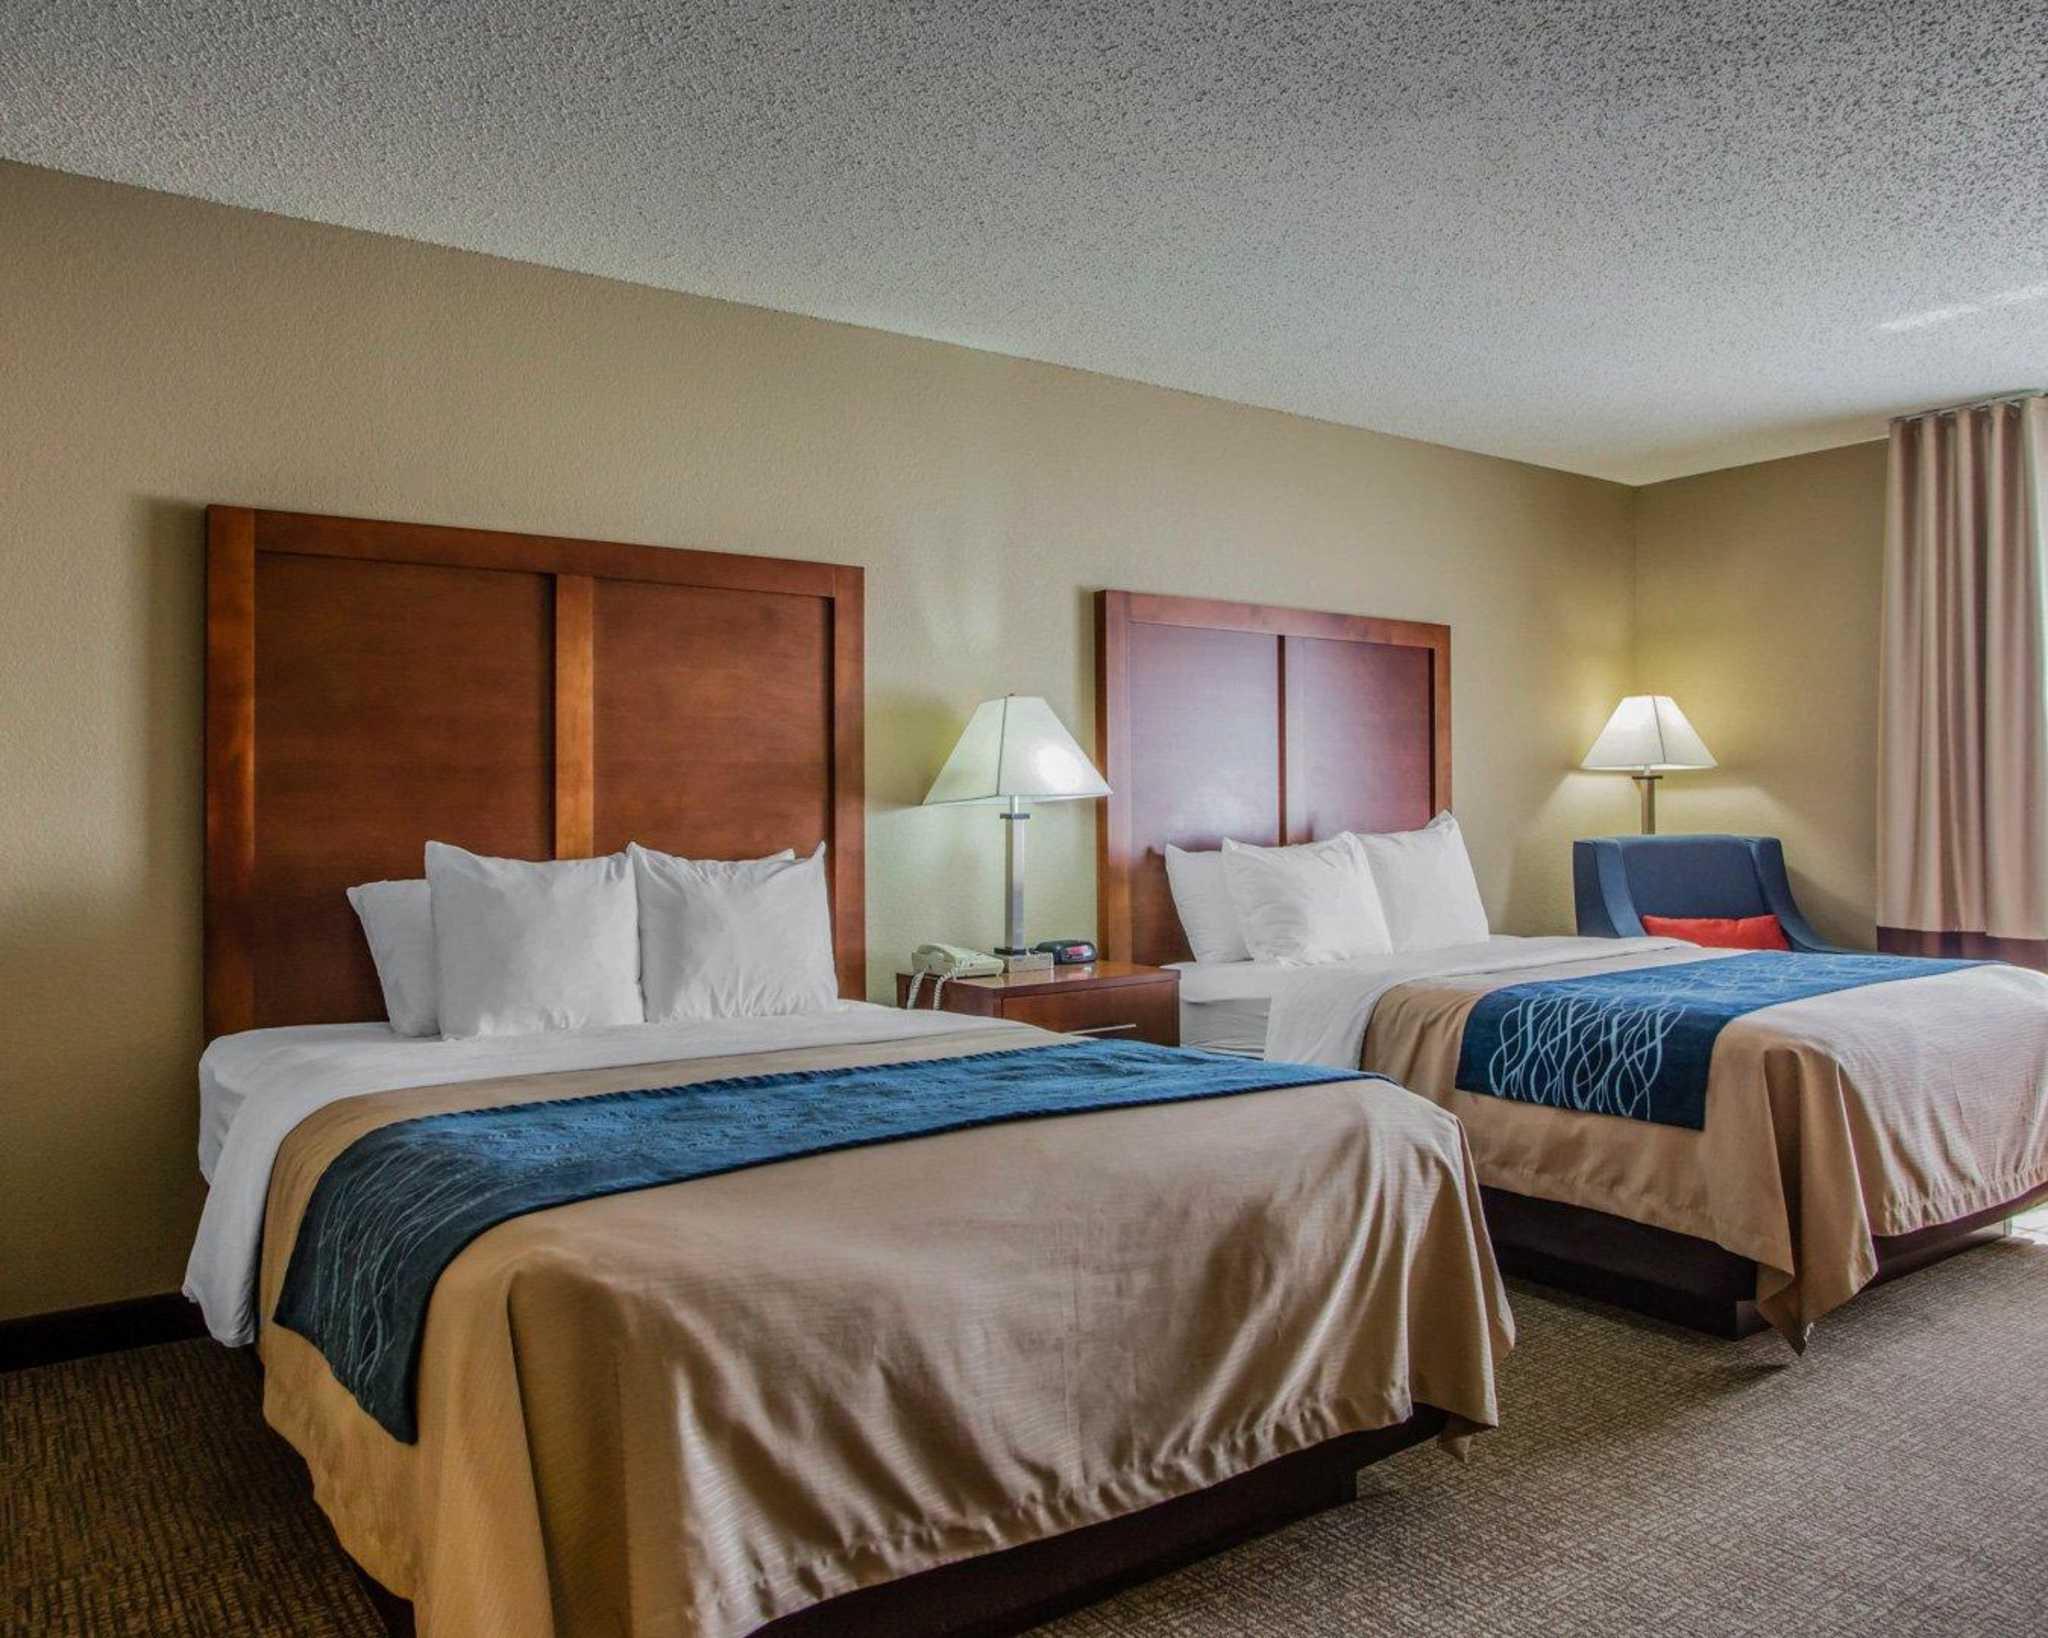 Comfort Inn & Suites Jackson - West Bend image 9